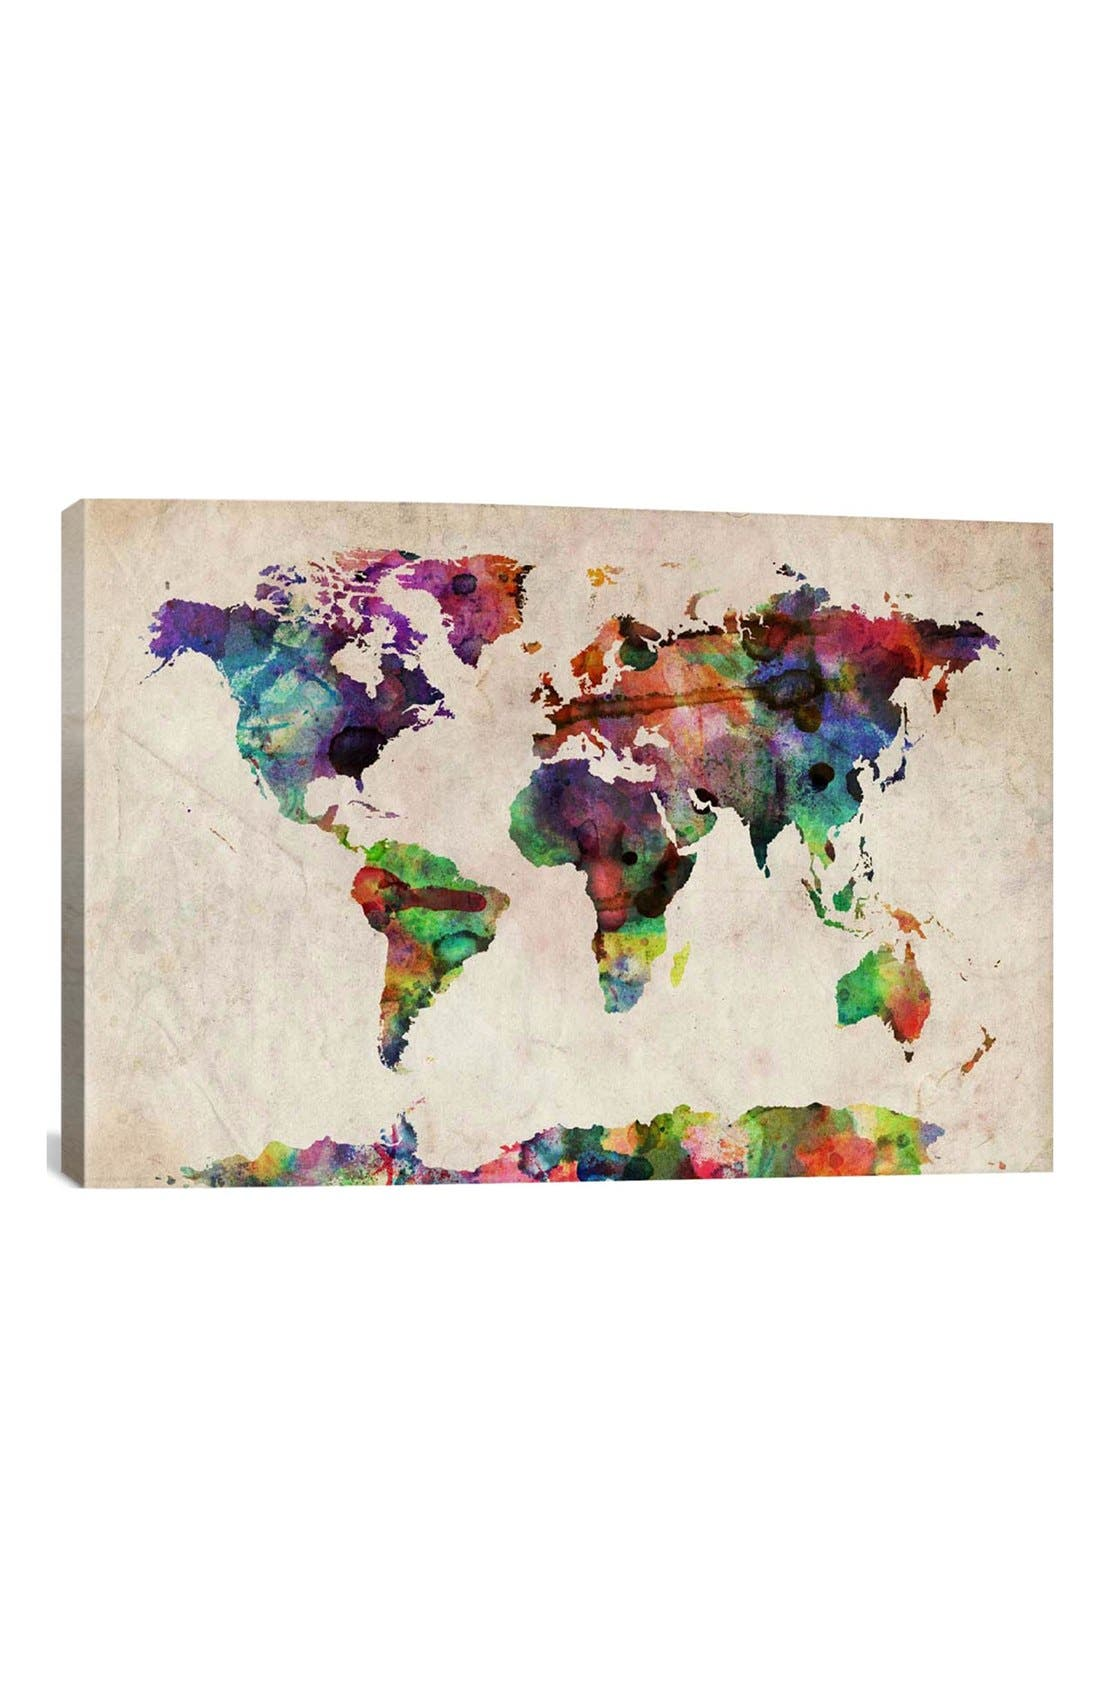 Alternate Image 1 Selected - iCanvas 'World Map Urban - Michael Thompsett' Giclée Print Canvas Art